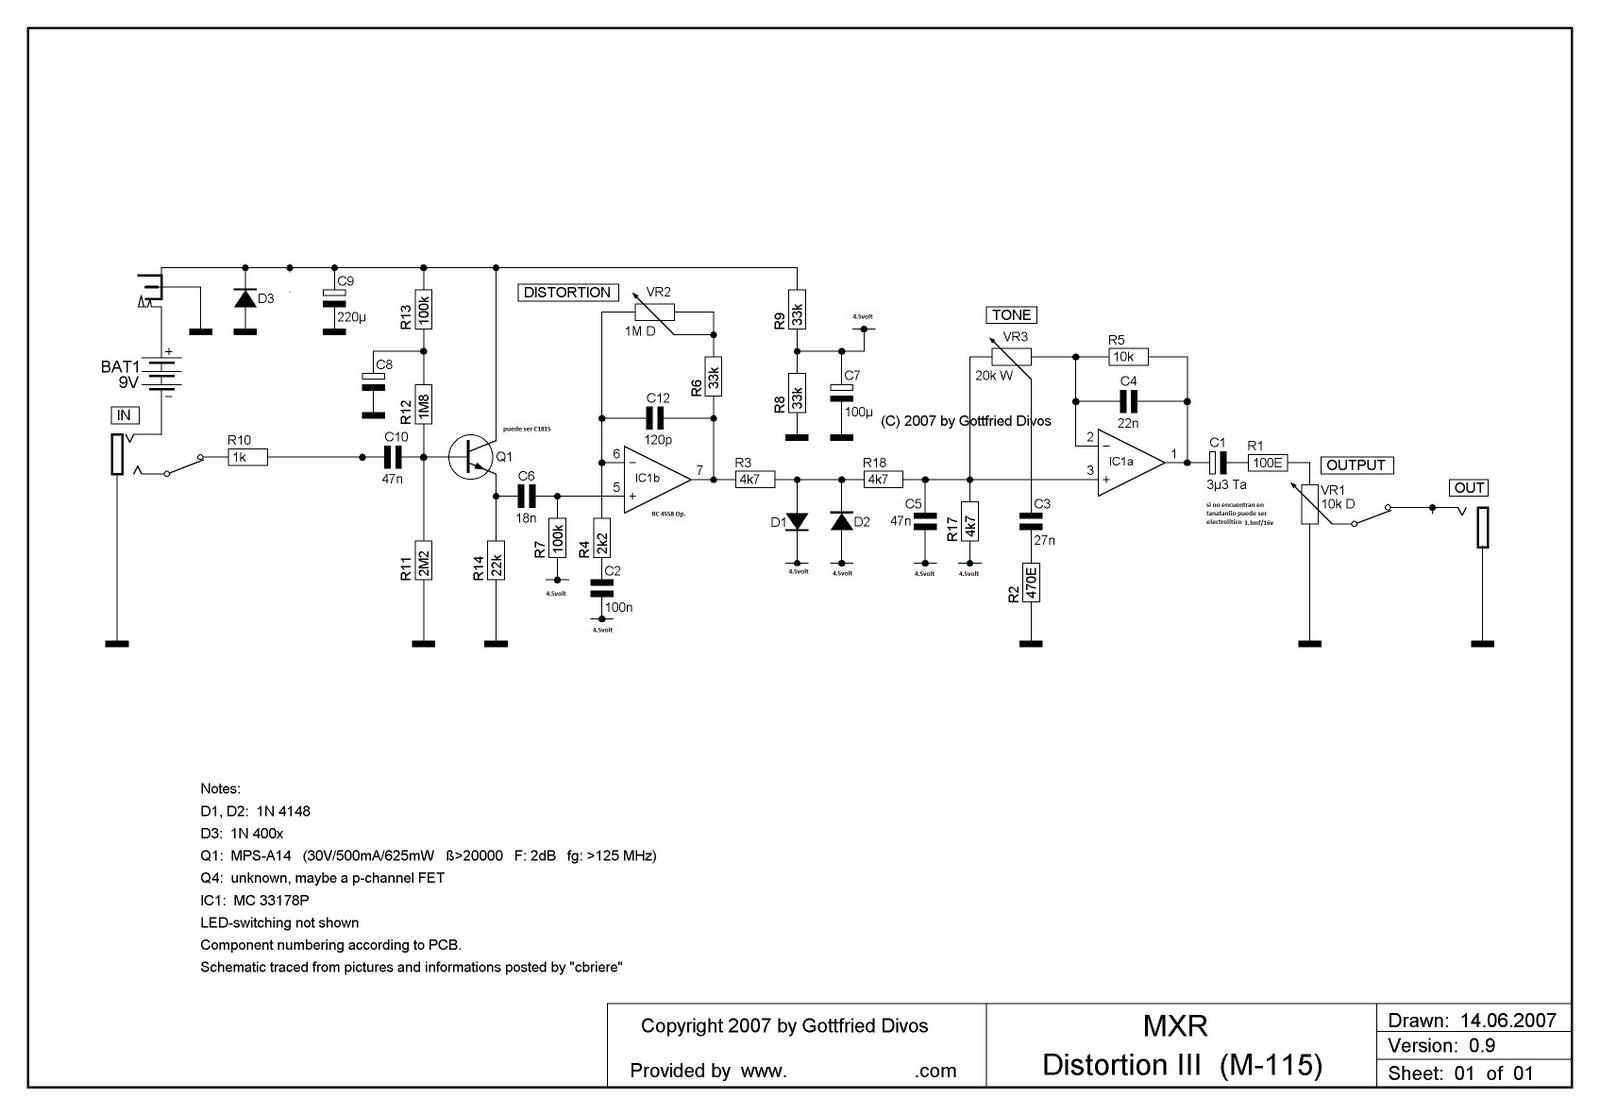 Wiring Diagram Guitar Pedal For Alternator To Battery Construye Tus Pedales Construccion De Dunlop Mxr